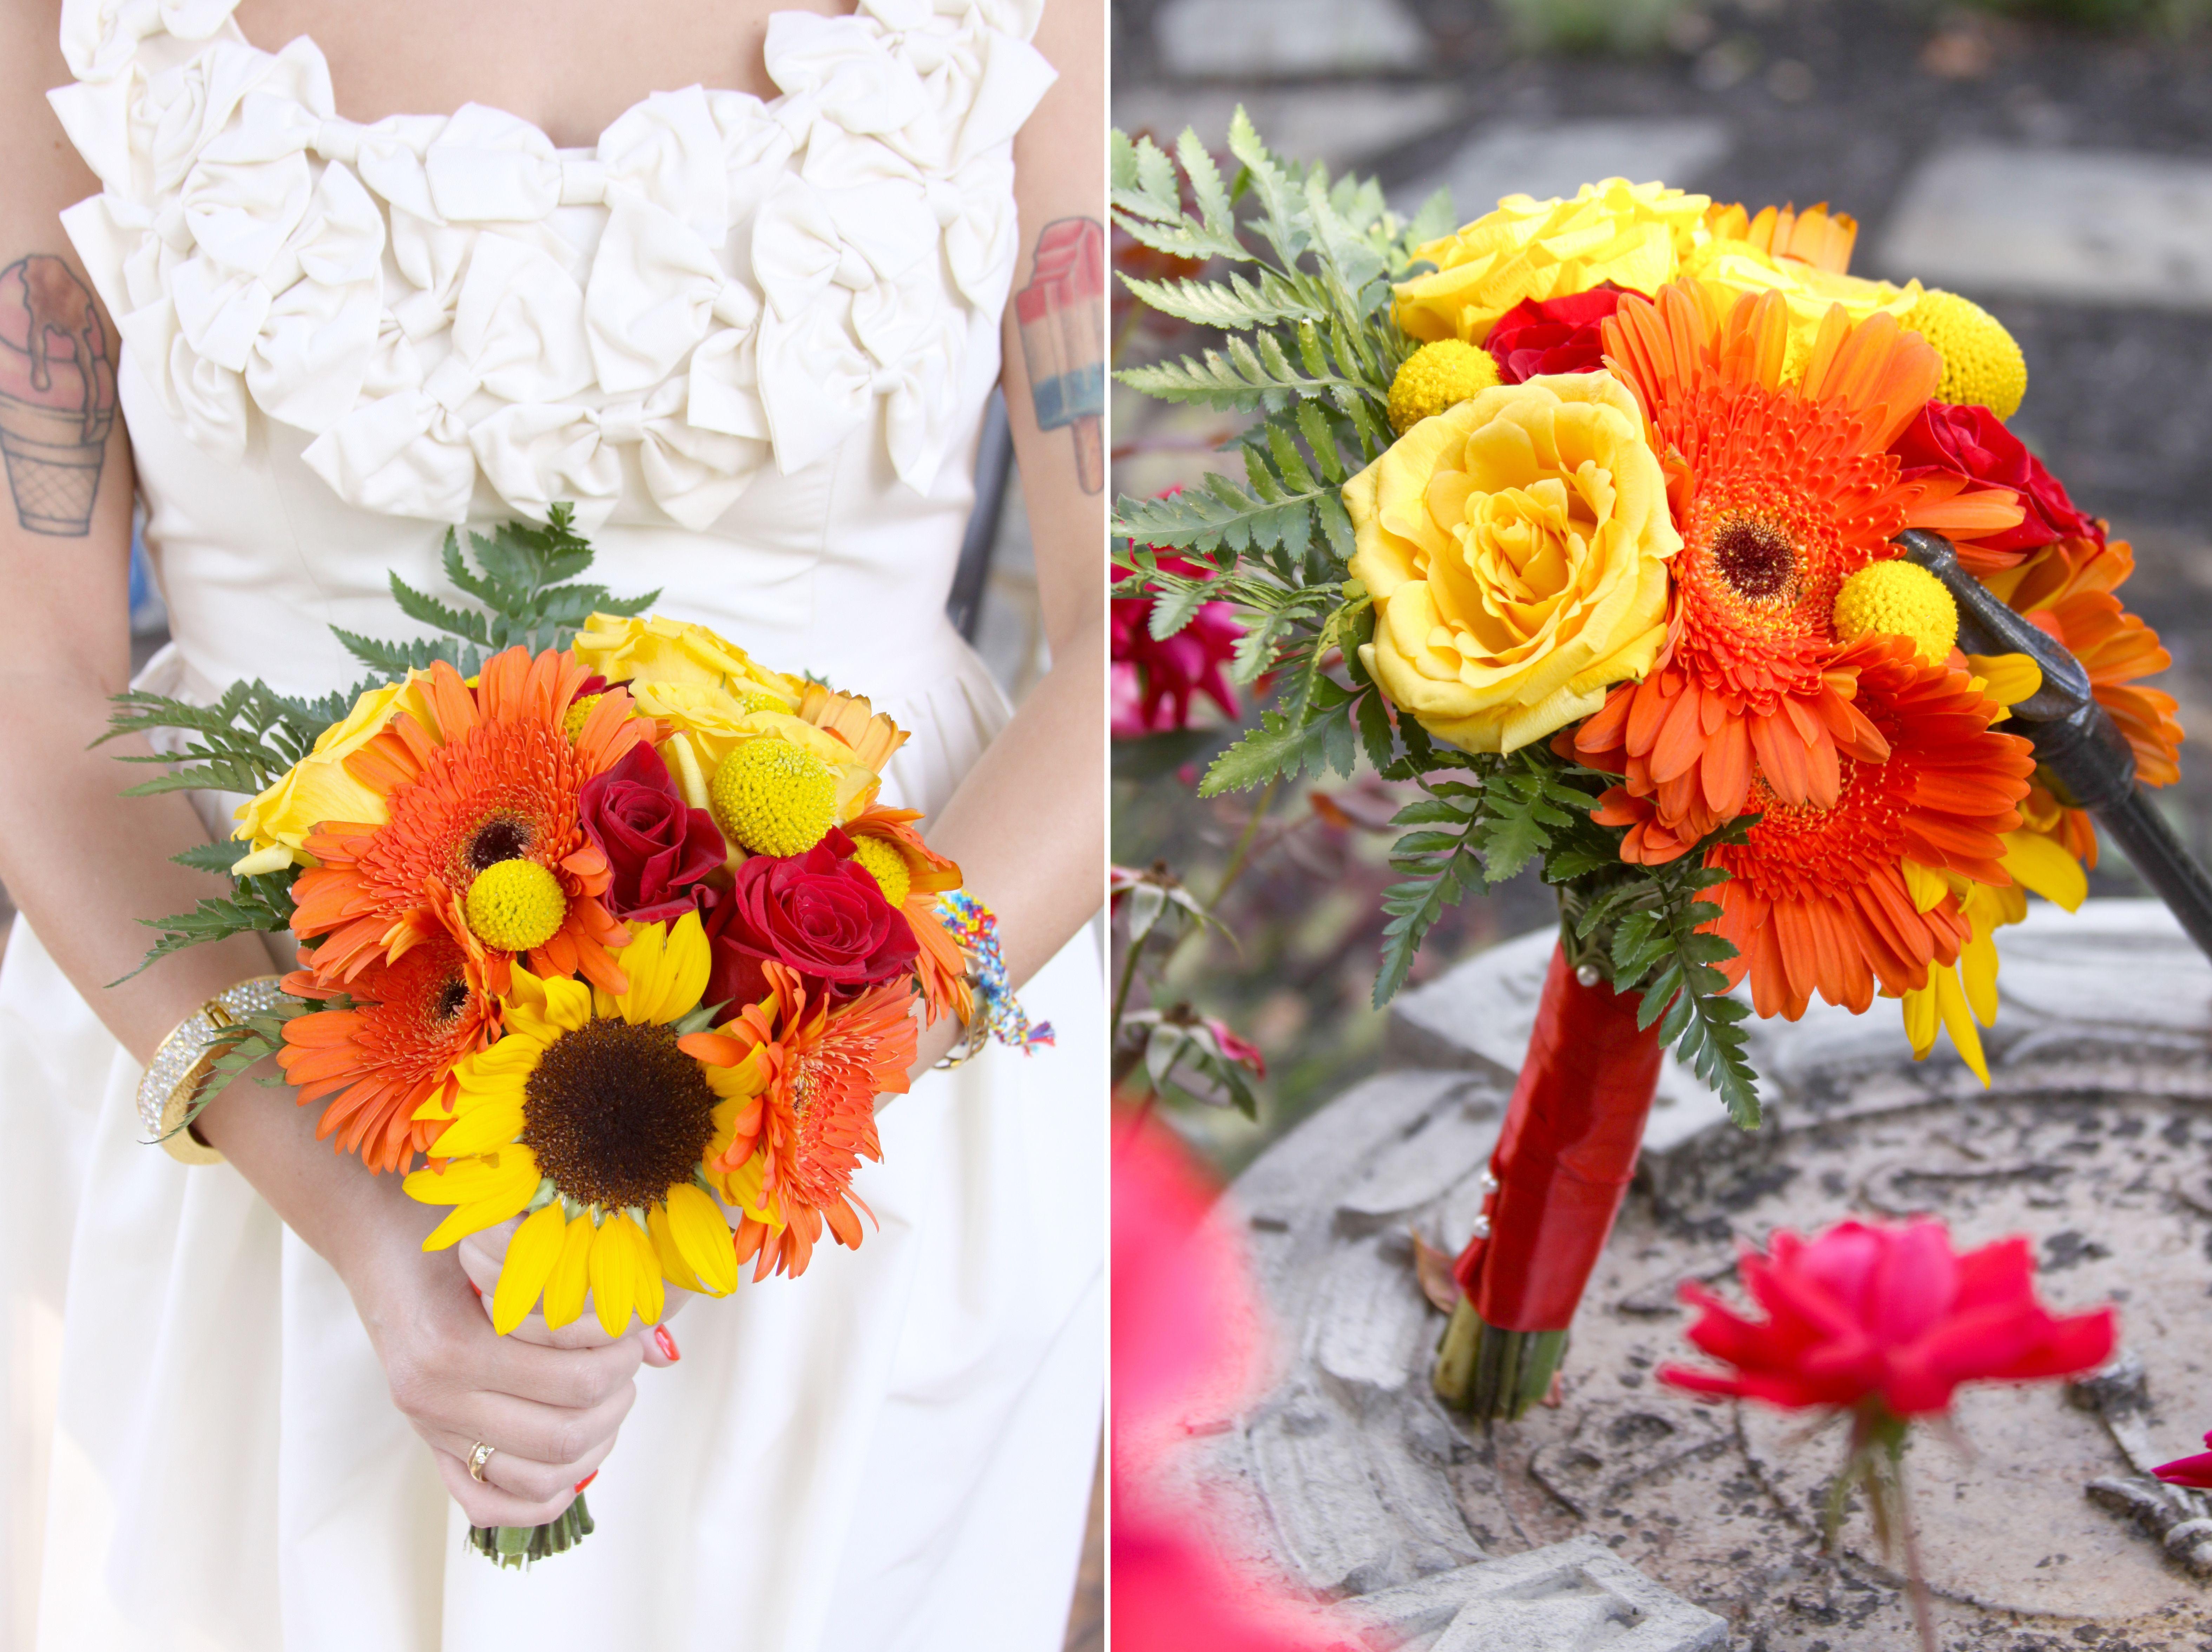 Chesapeake Bay Area Wedding Photography. Http